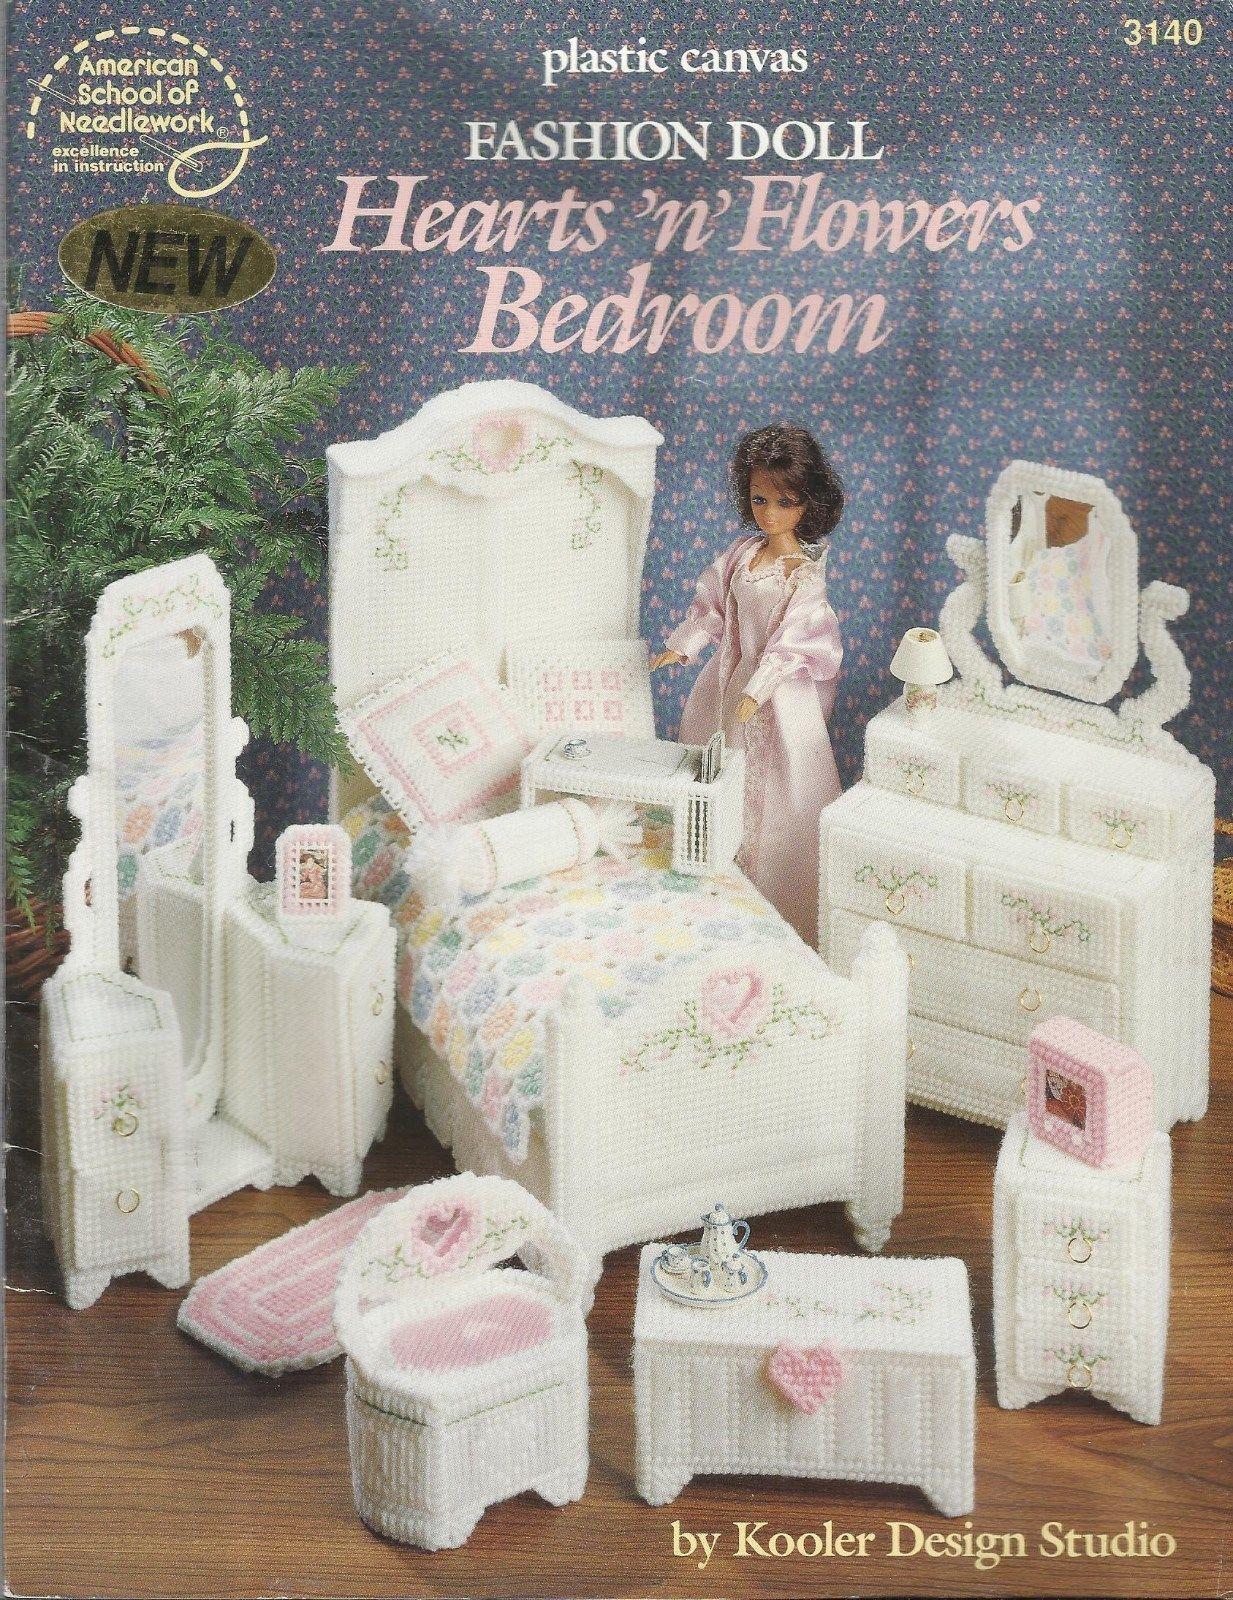 Plastic canvas fashion doll furniture patterns 18